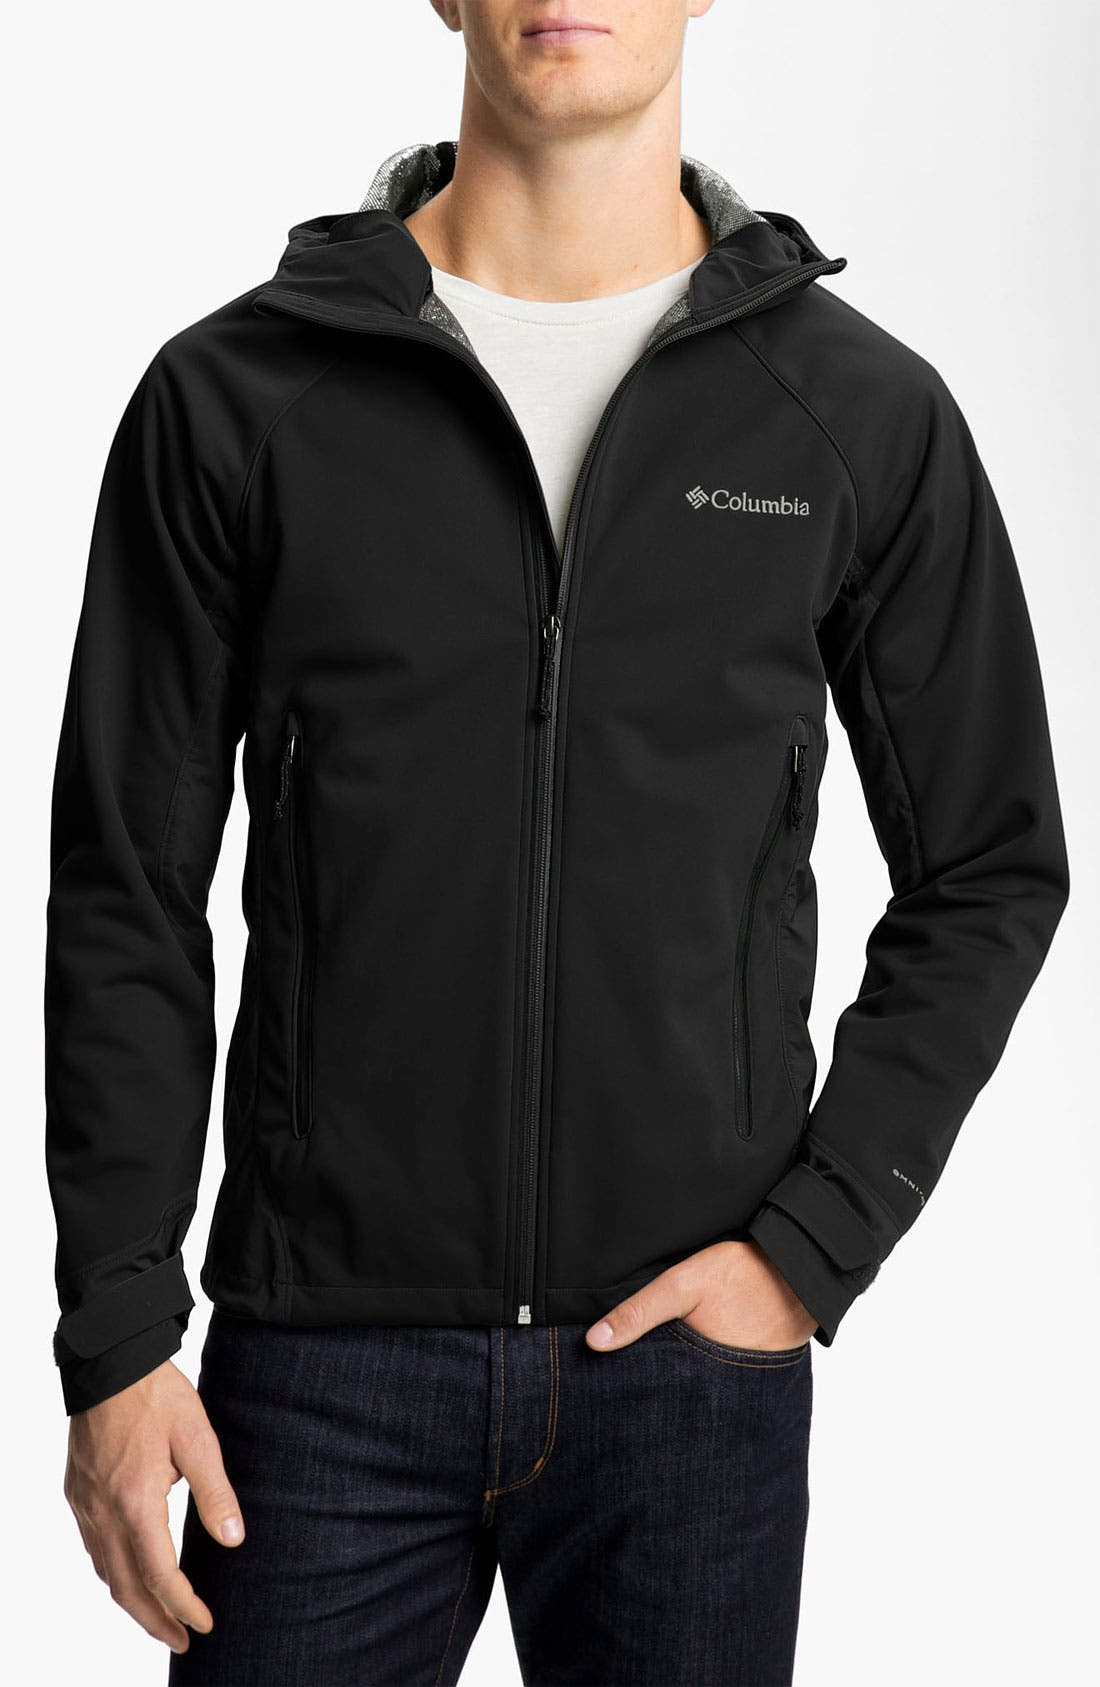 Alternate Image 1 Selected - Columbia 'Triteca' Soft Shell Jacket